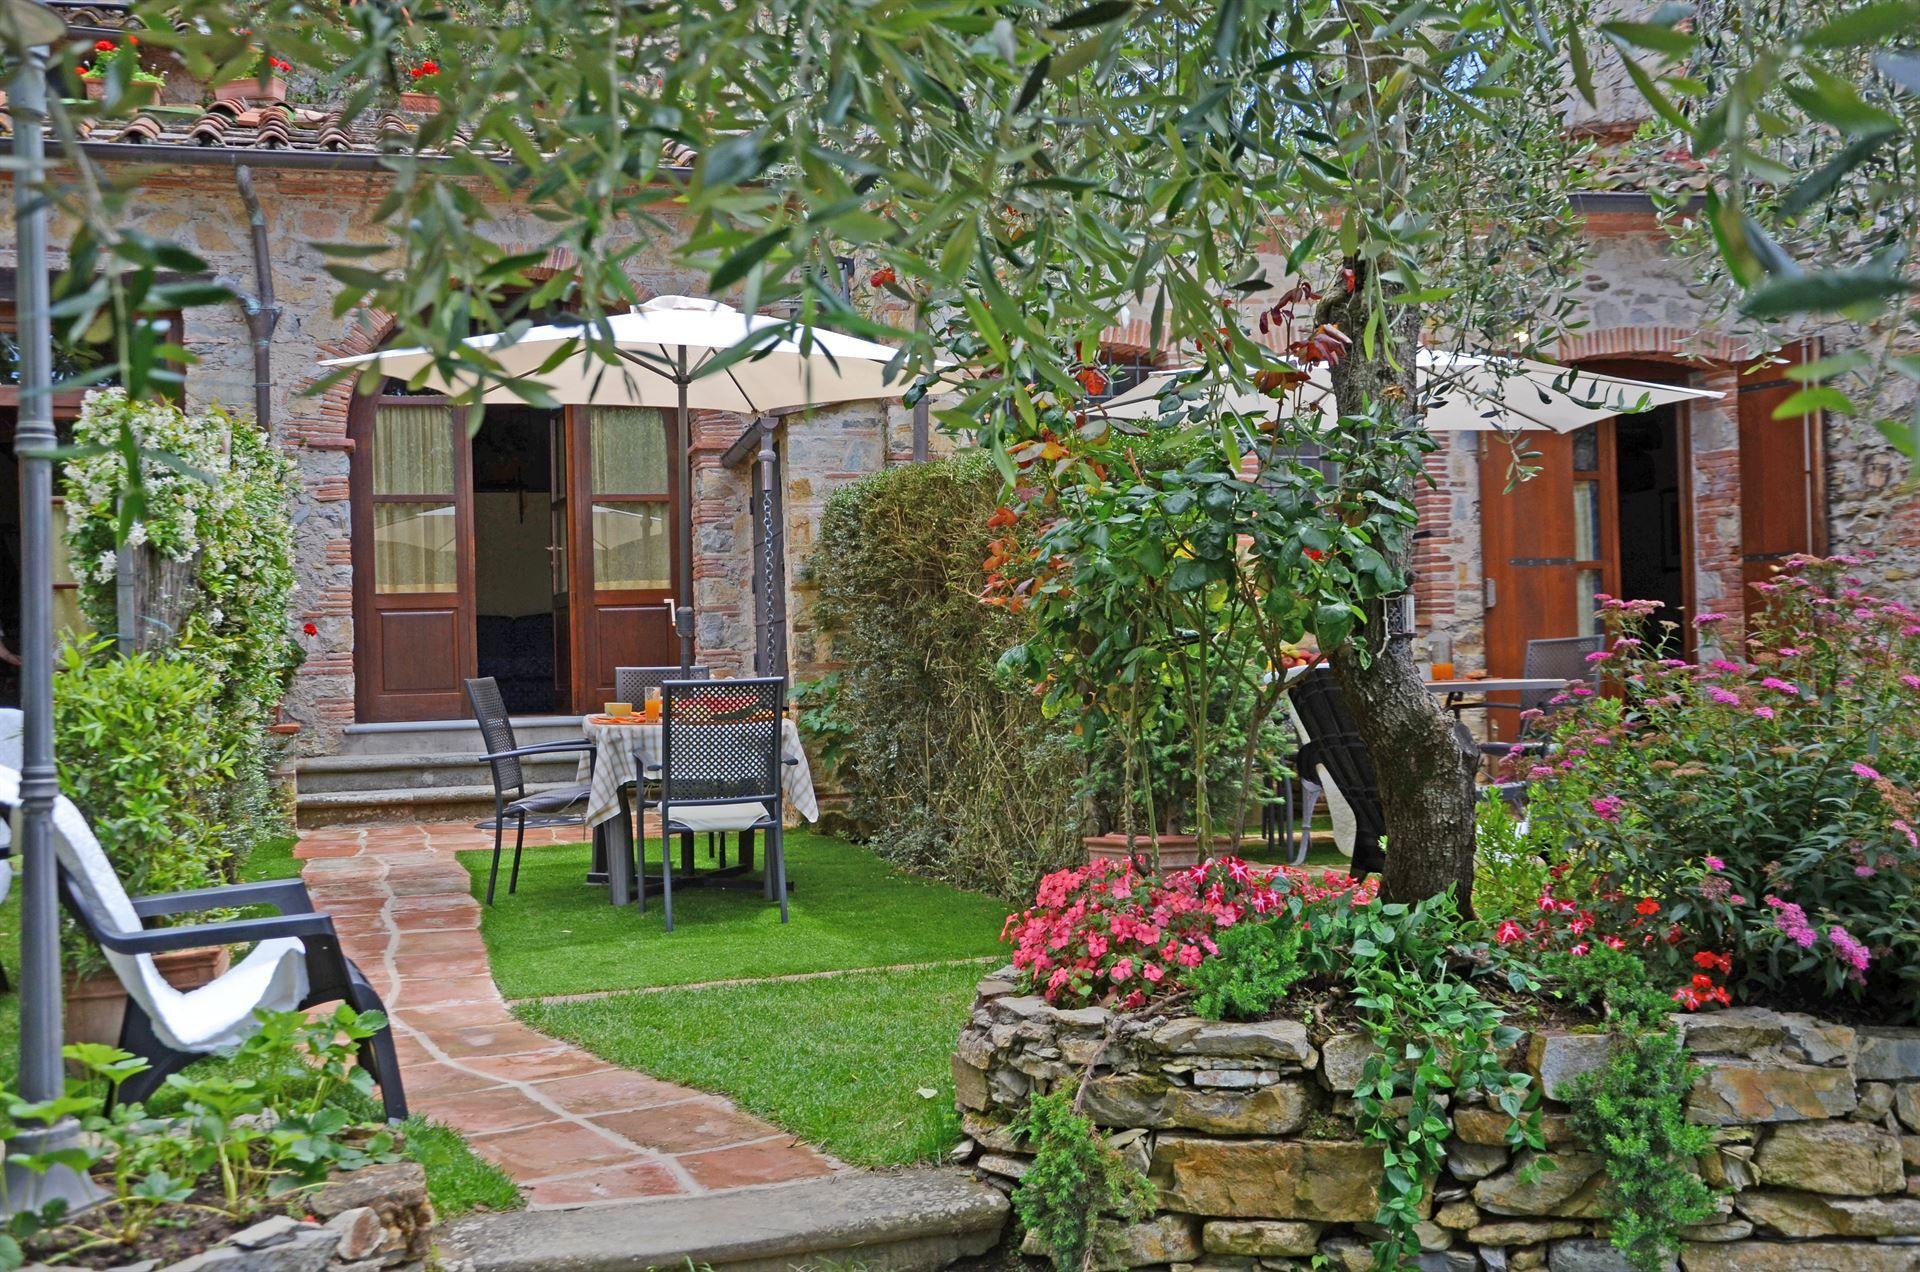 Ferienhaus Francesca 2 Villa Ricetro Toskana Urlaub In Montemagno Camaiore Lucca Toskana Italien Mit Bildern Toskana Urlaub Terassenideen Outdoor Dekorationen